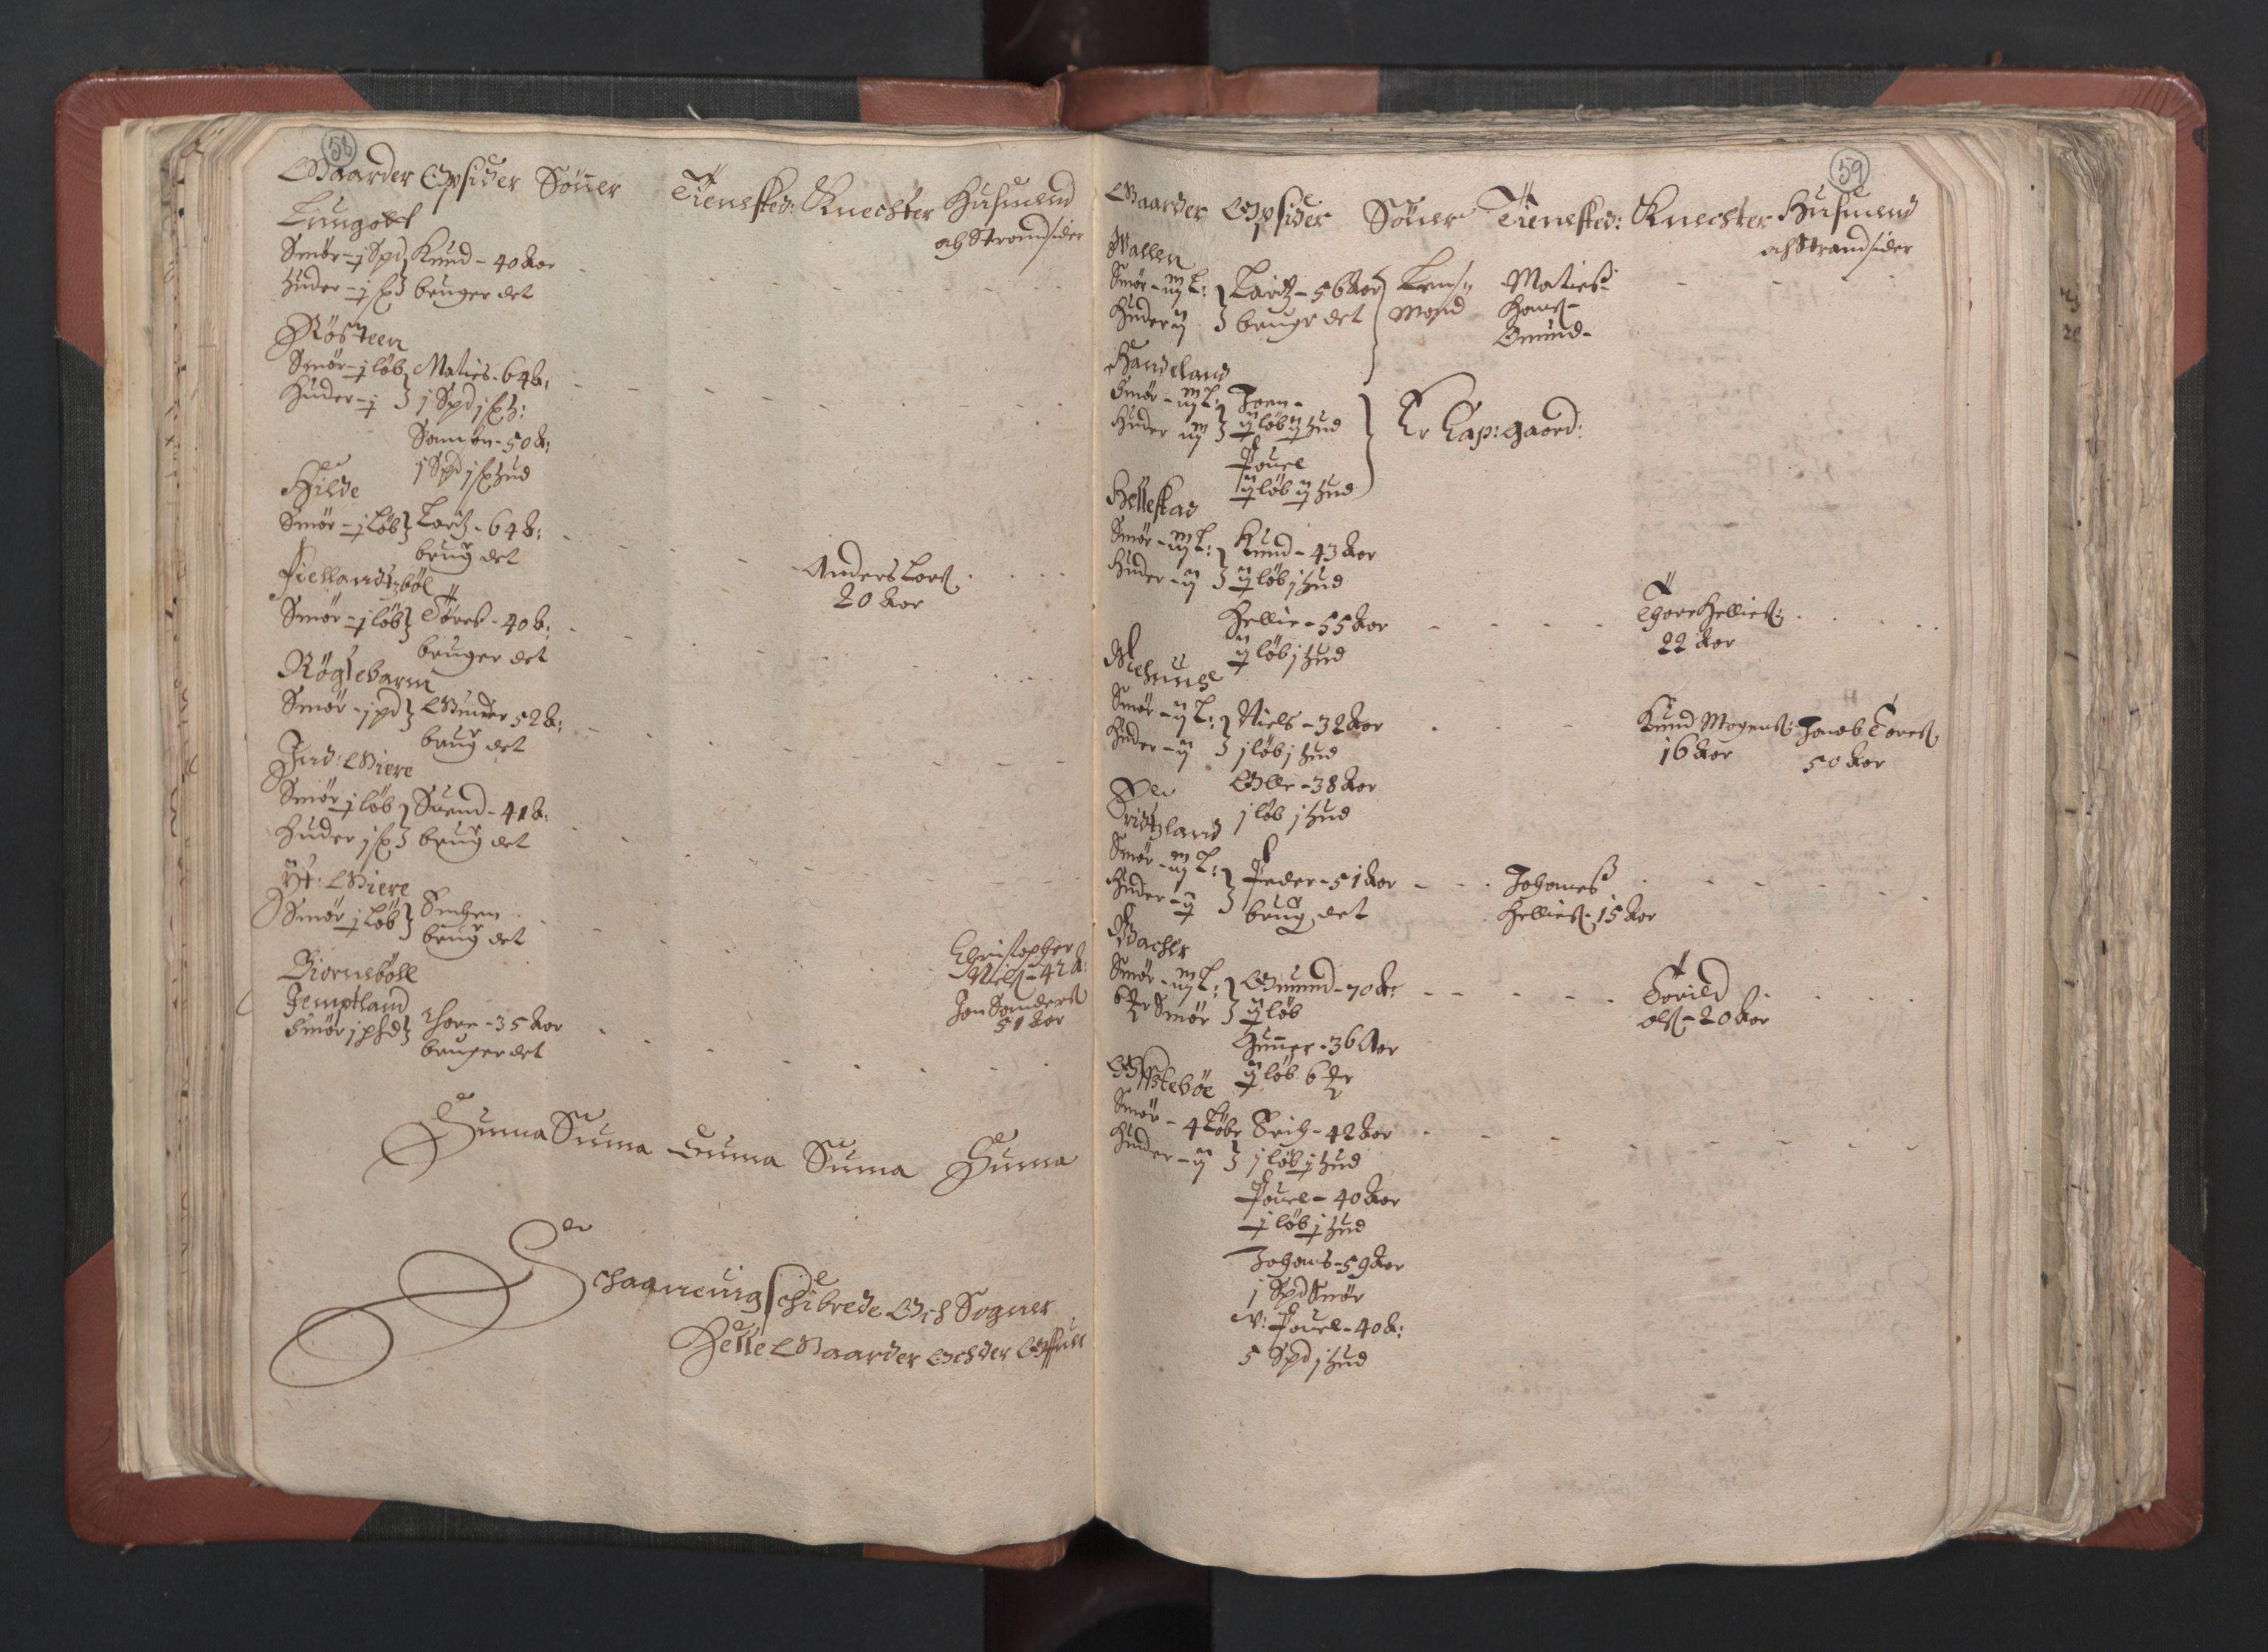 RA, Fogdenes og sorenskrivernes manntall 1664-1666, nr. 13: Nordhordland fogderi og Sunnhordland fogderi, 1665, s. 58-59